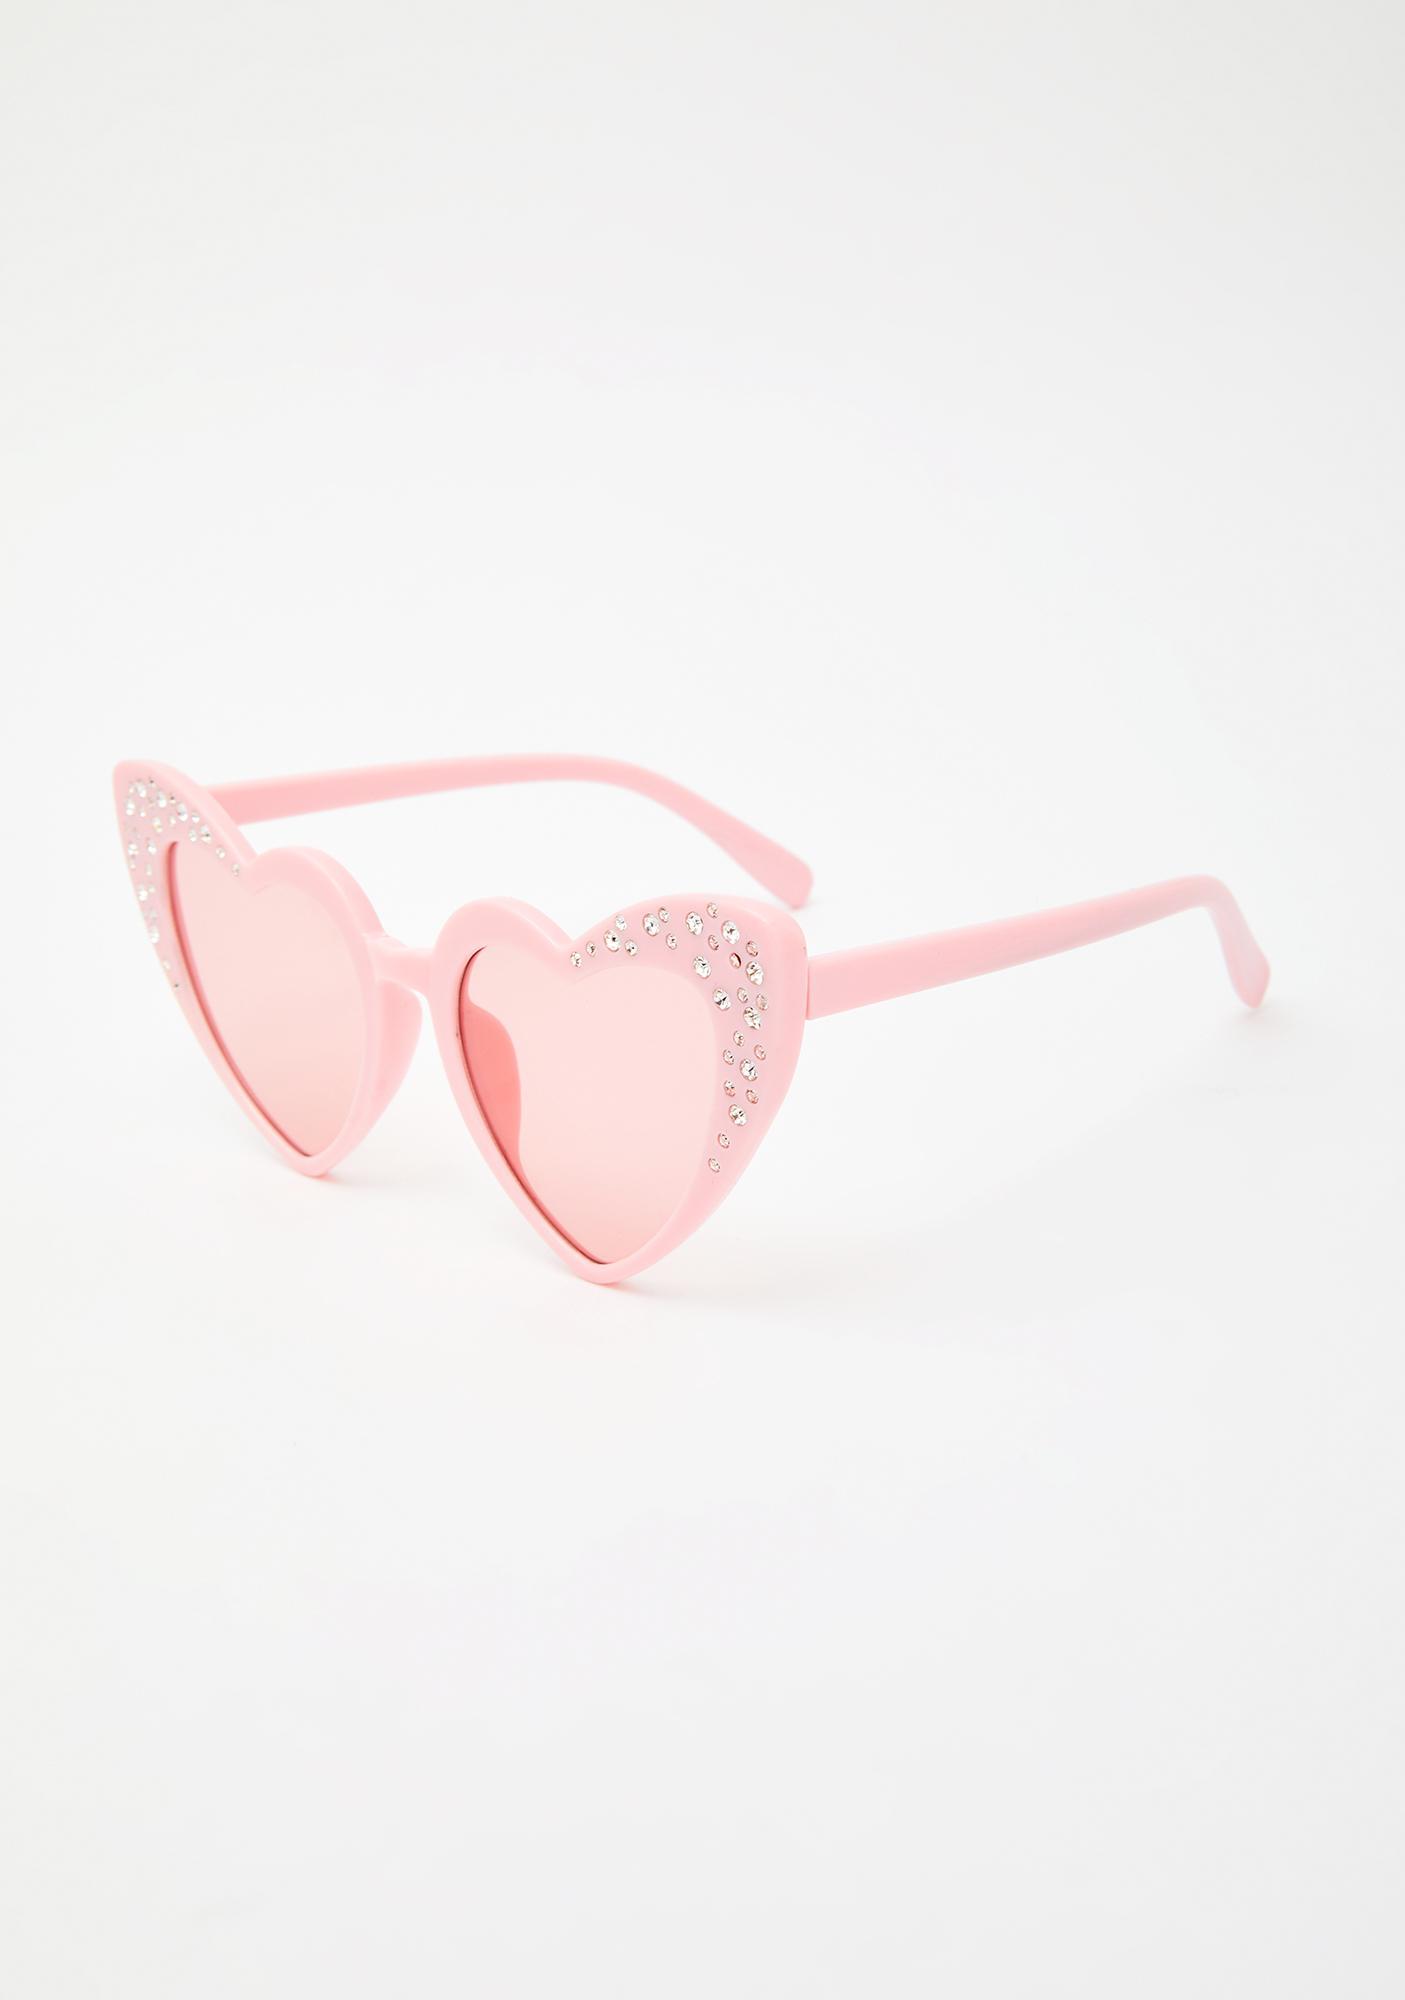 Sweet Femme Doll Heart Sunglasses